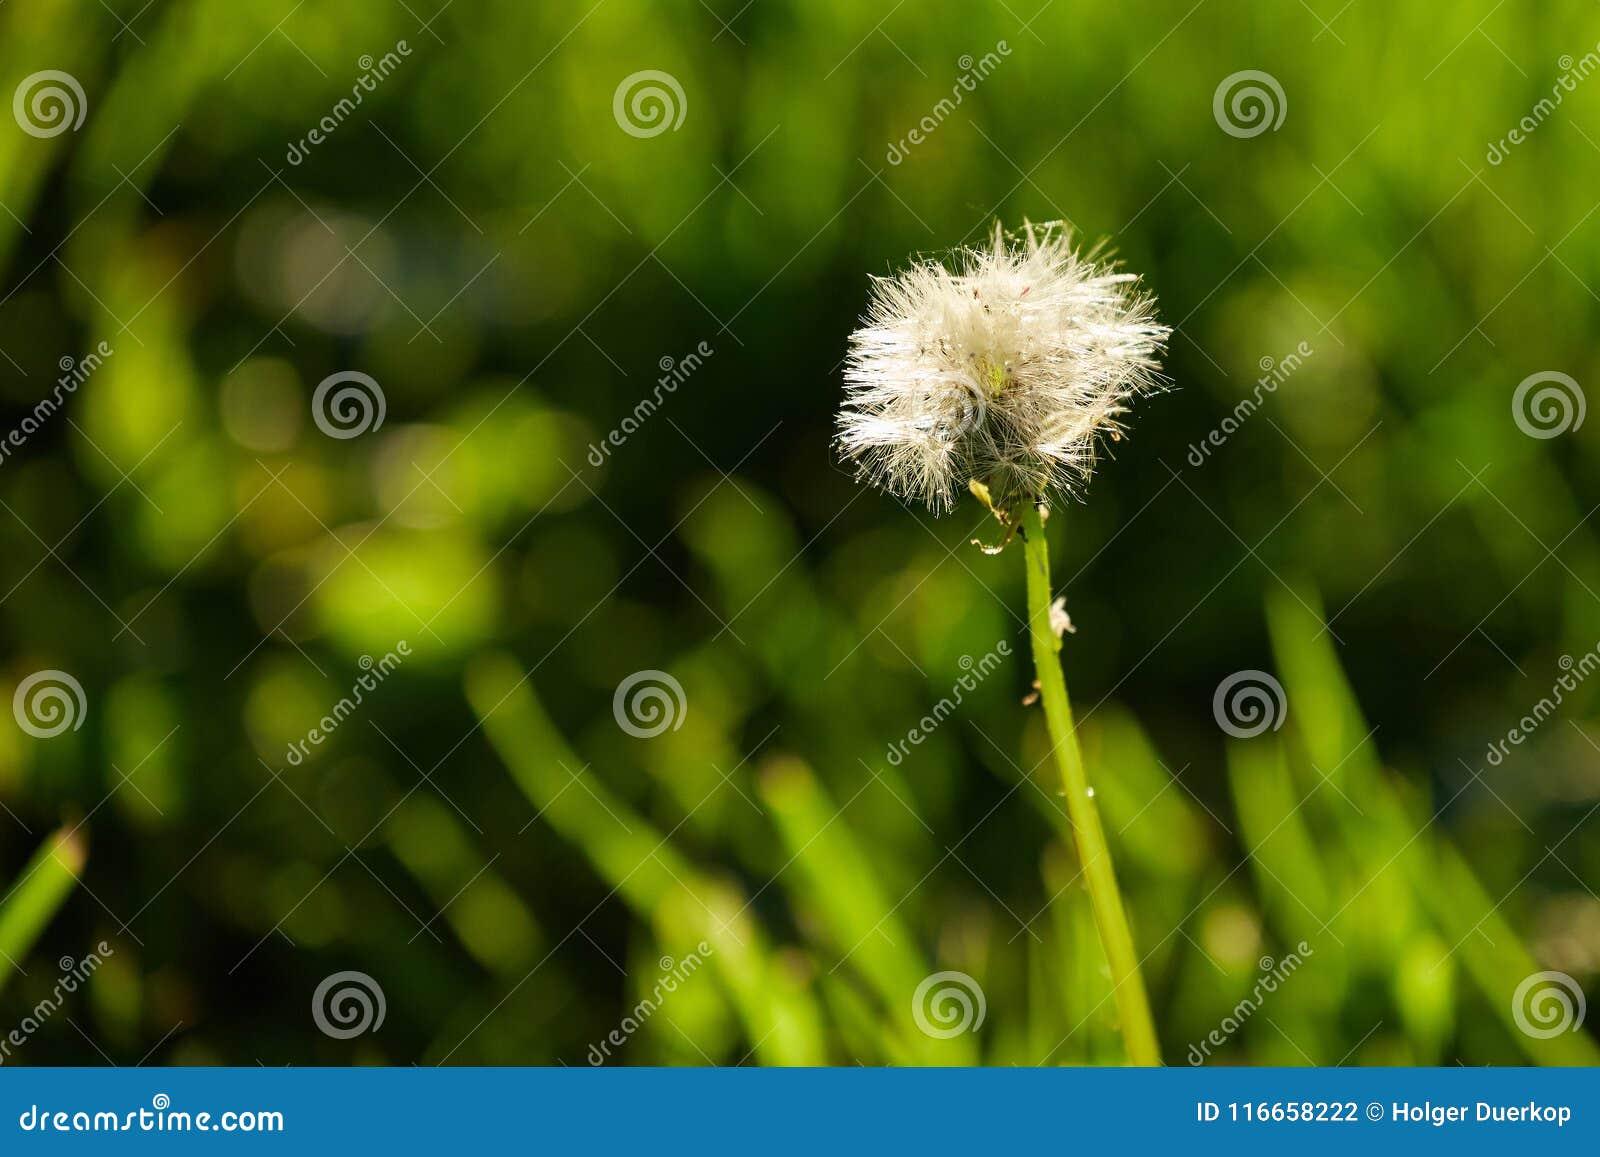 Dandelion in spring light